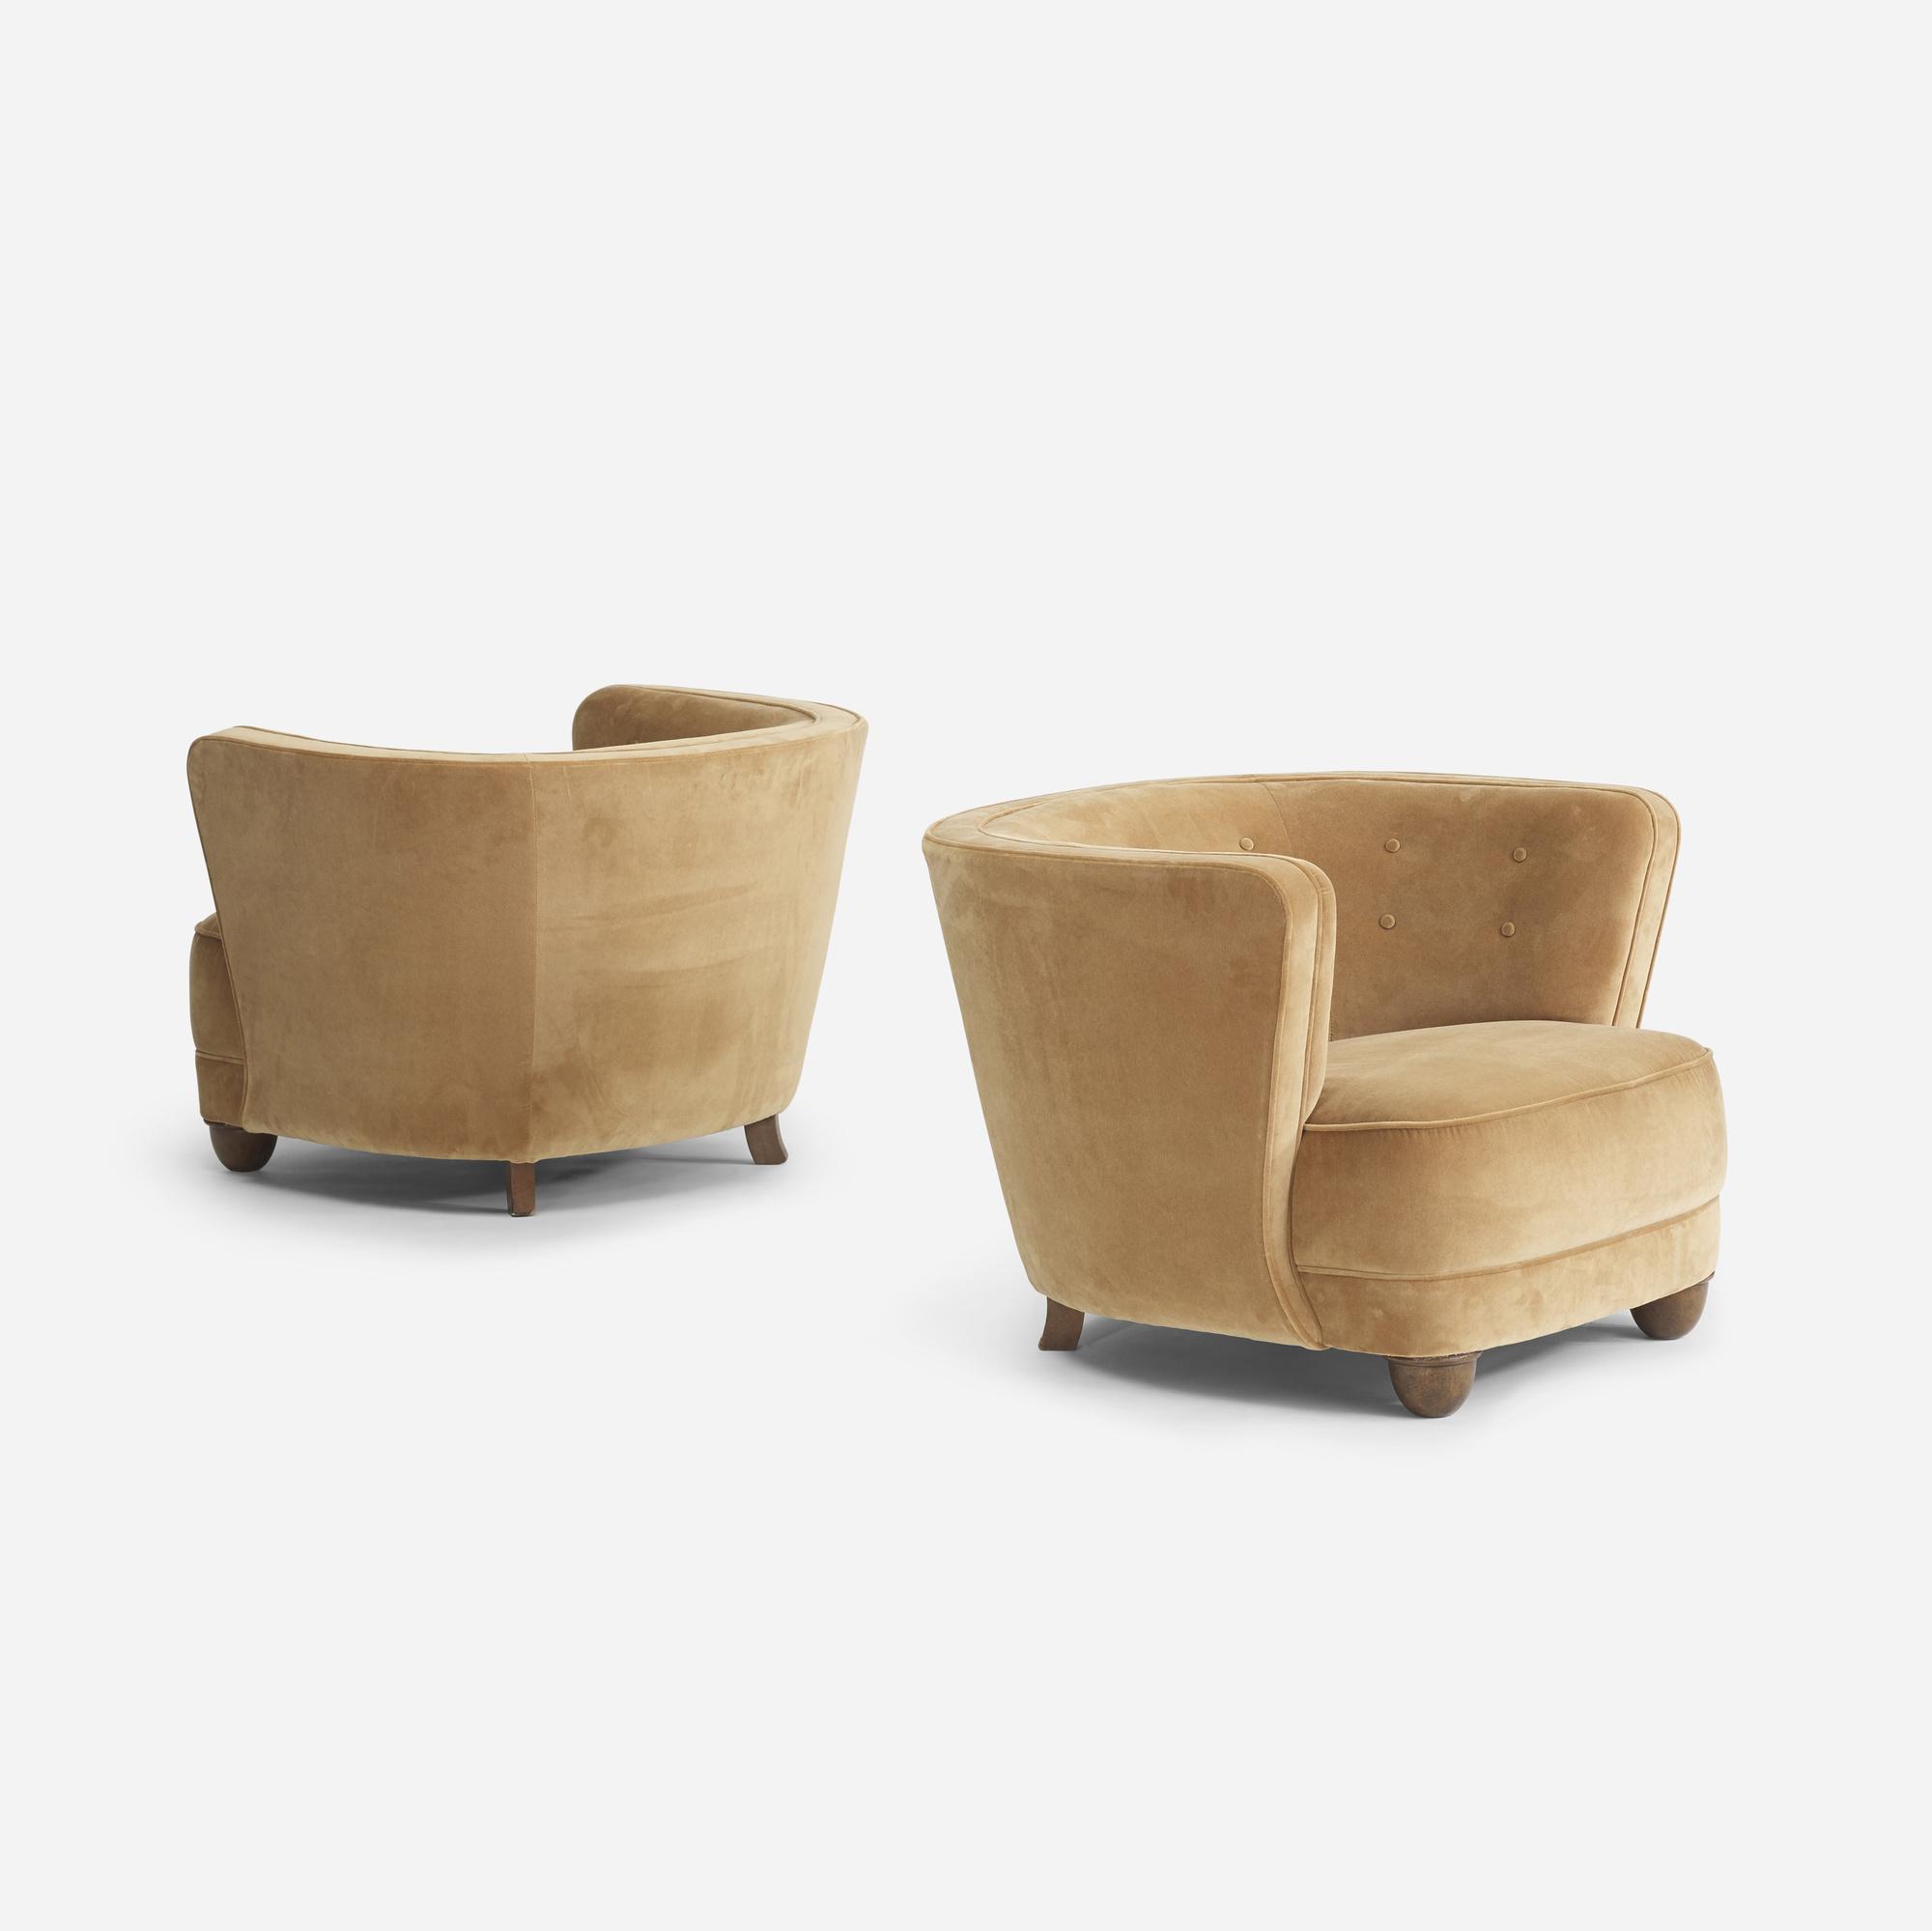 111: Danish Cabinetmaker / lounge chairs, pair (2 of 4)